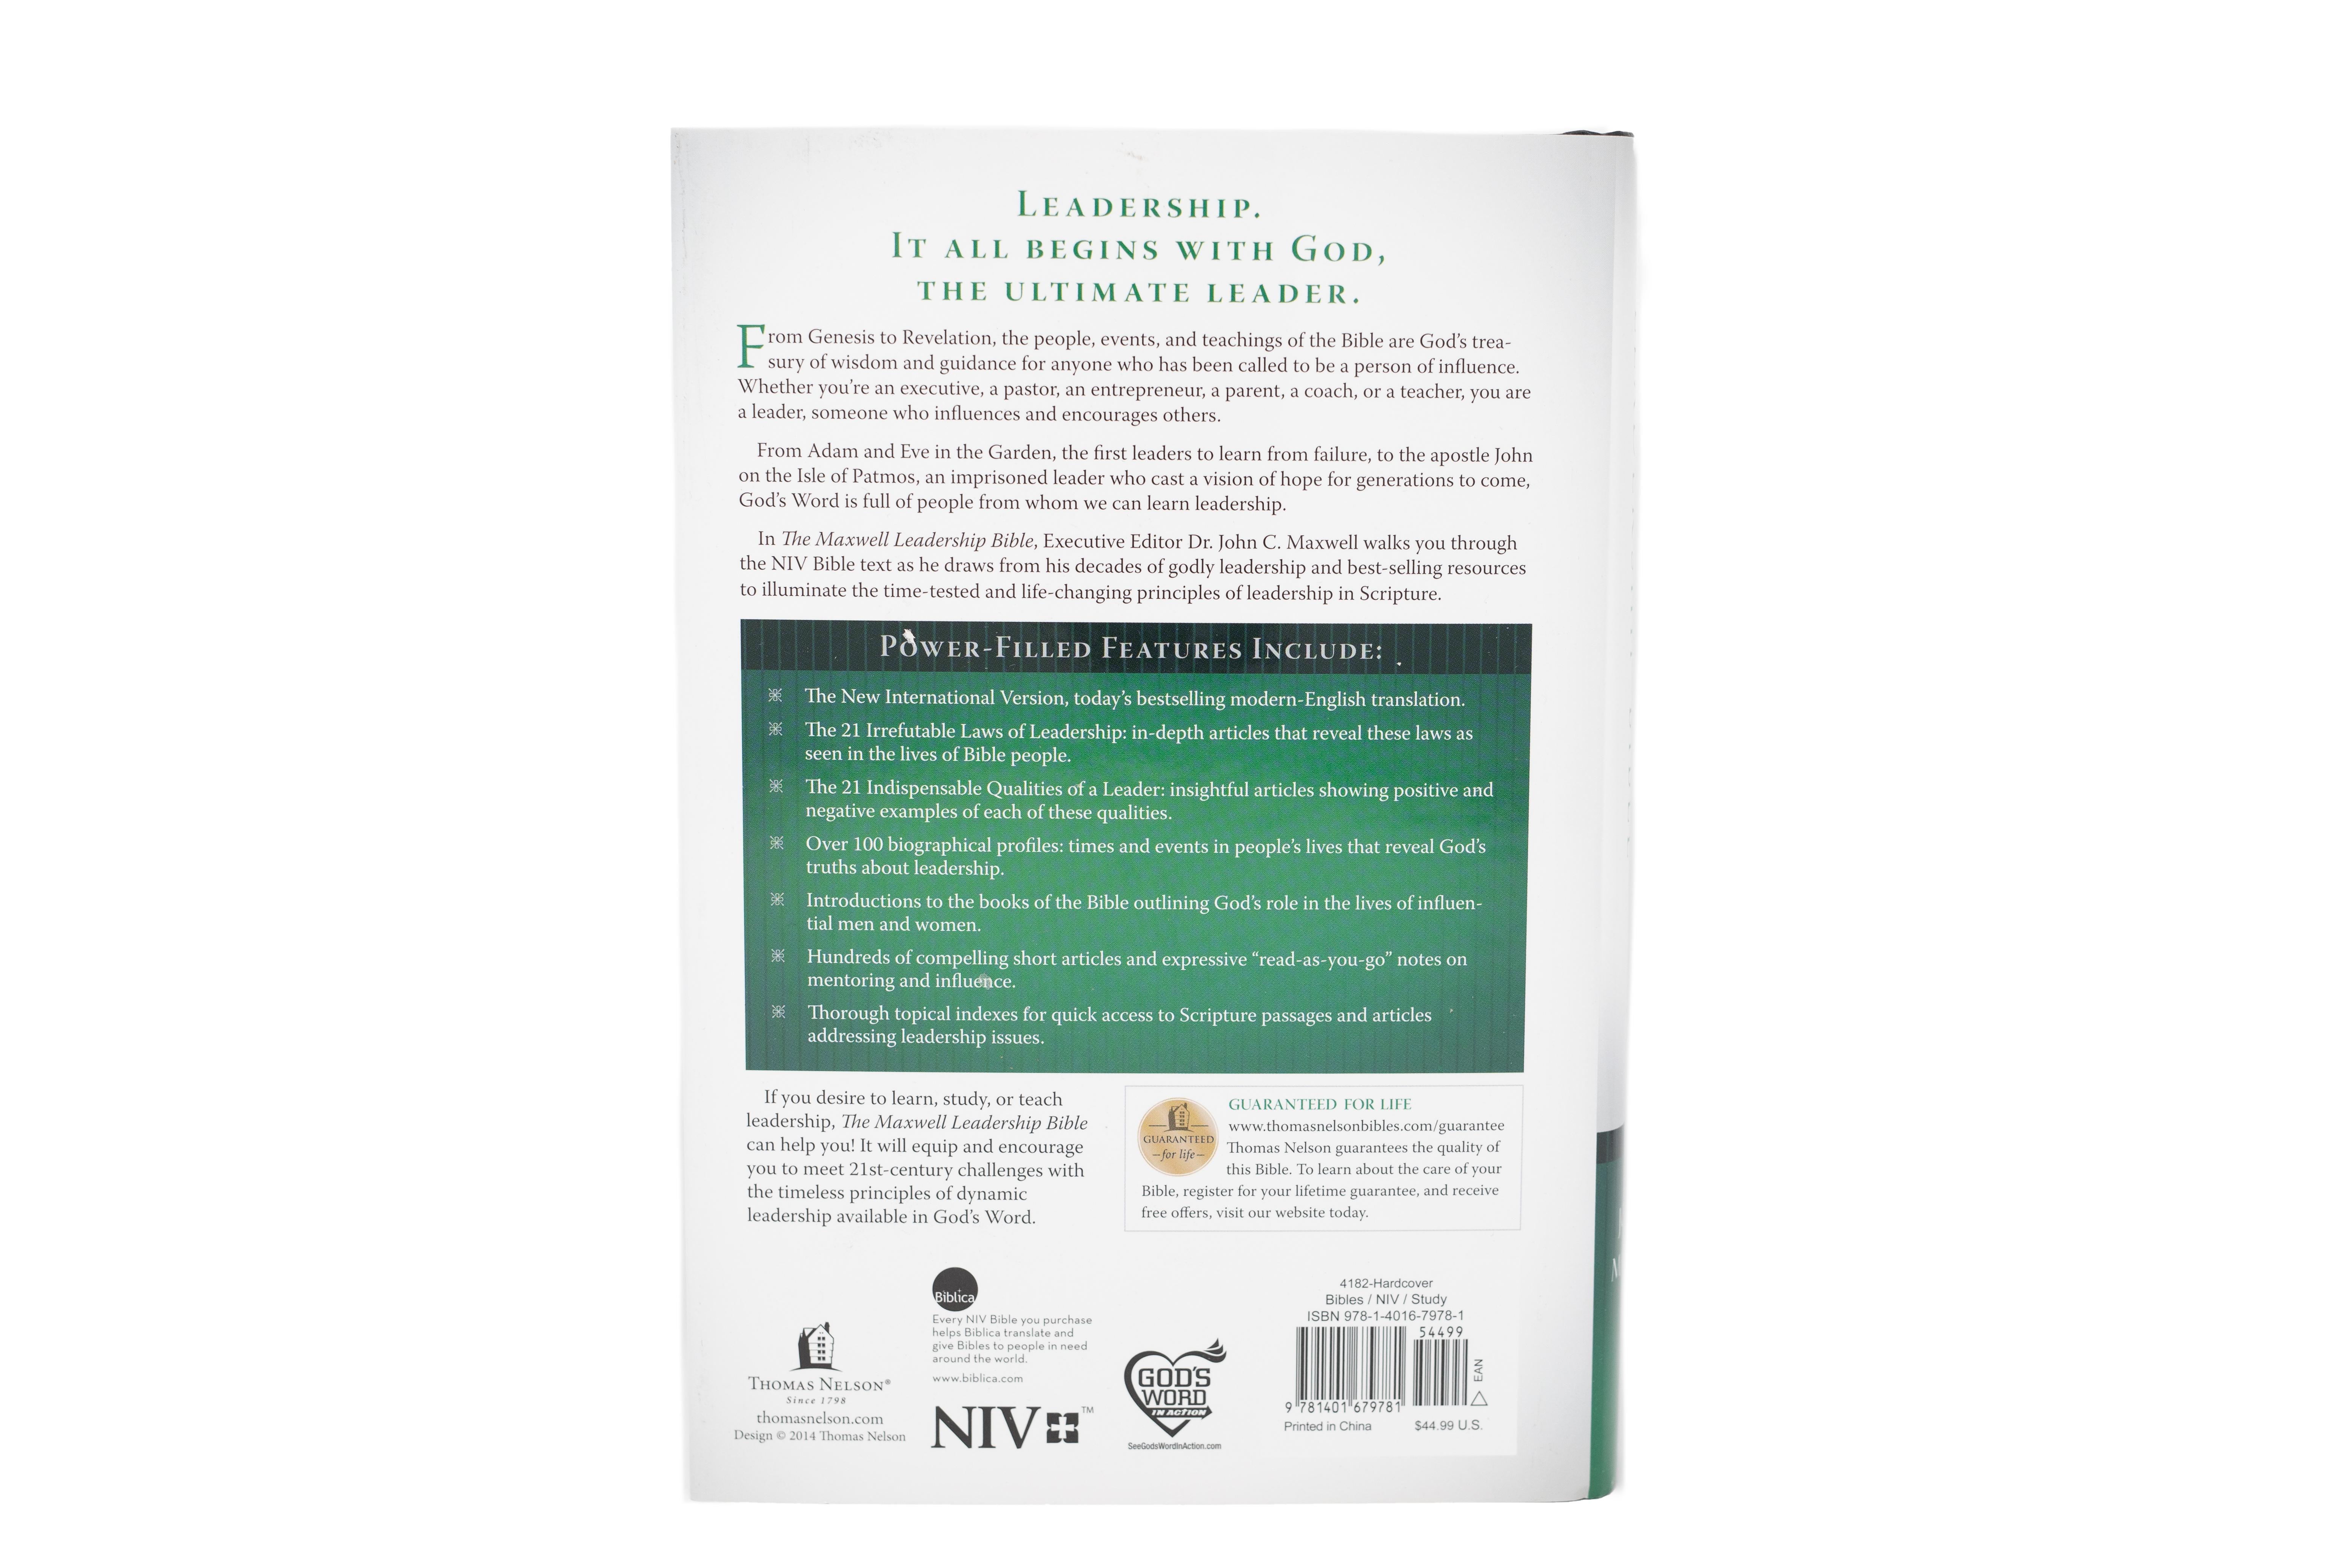 The Maxwell Leadership Bible - Hardcover [NIV]